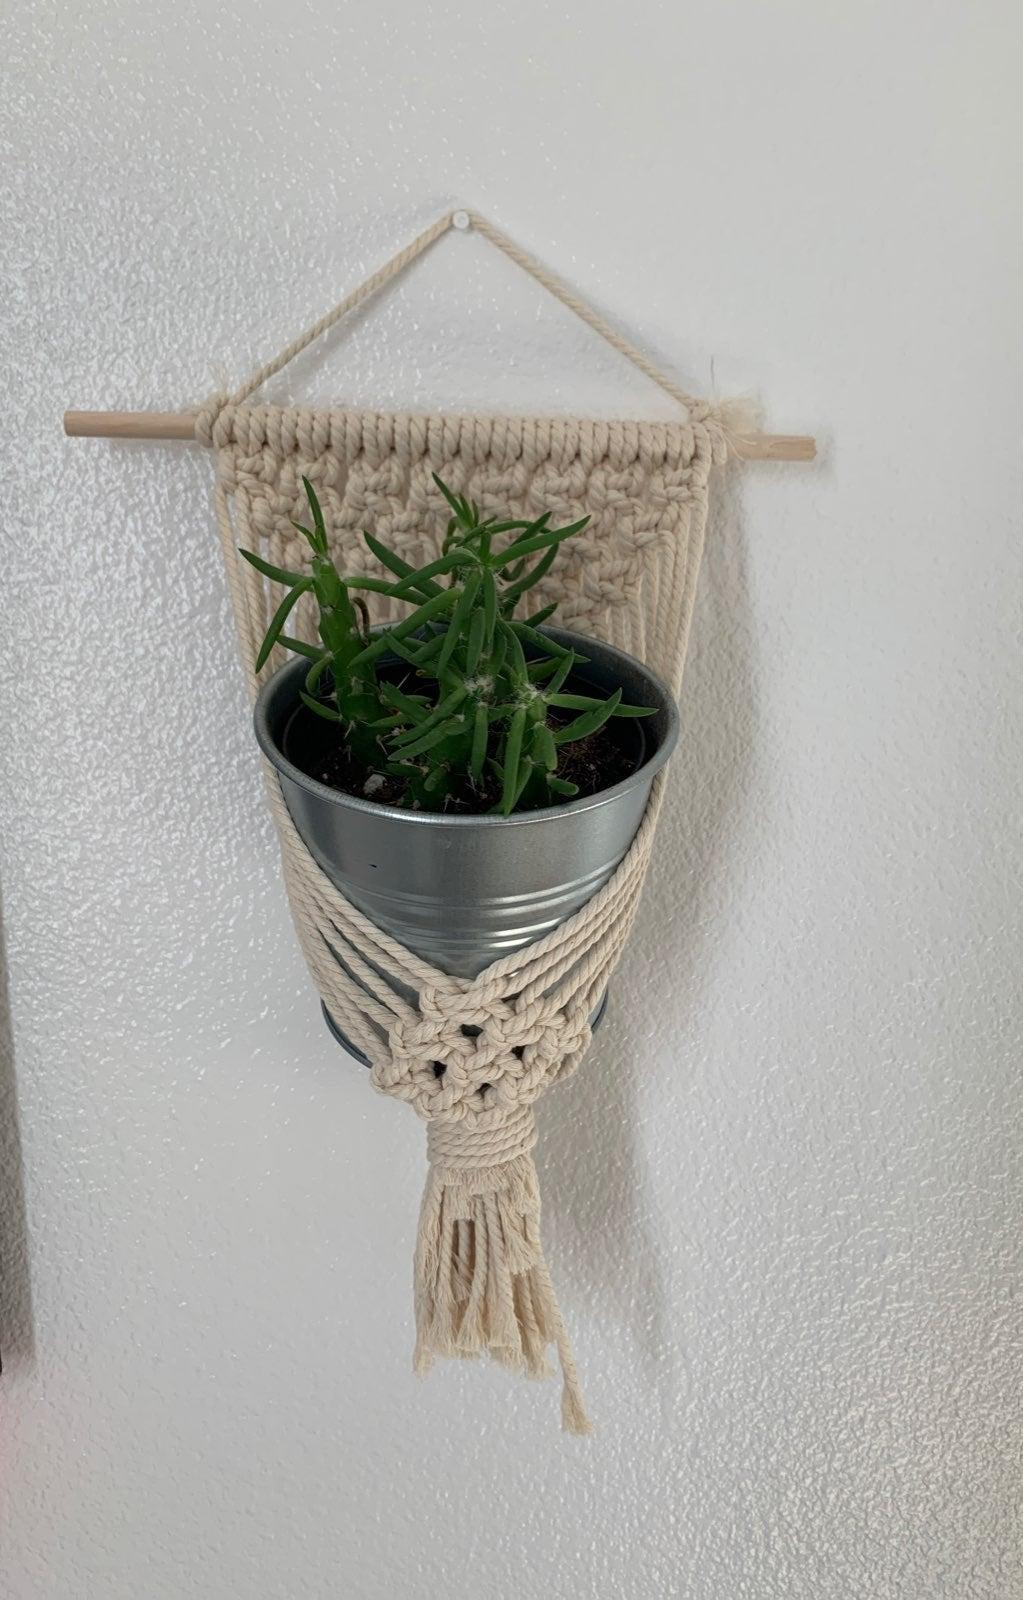 Macrame plant holder!